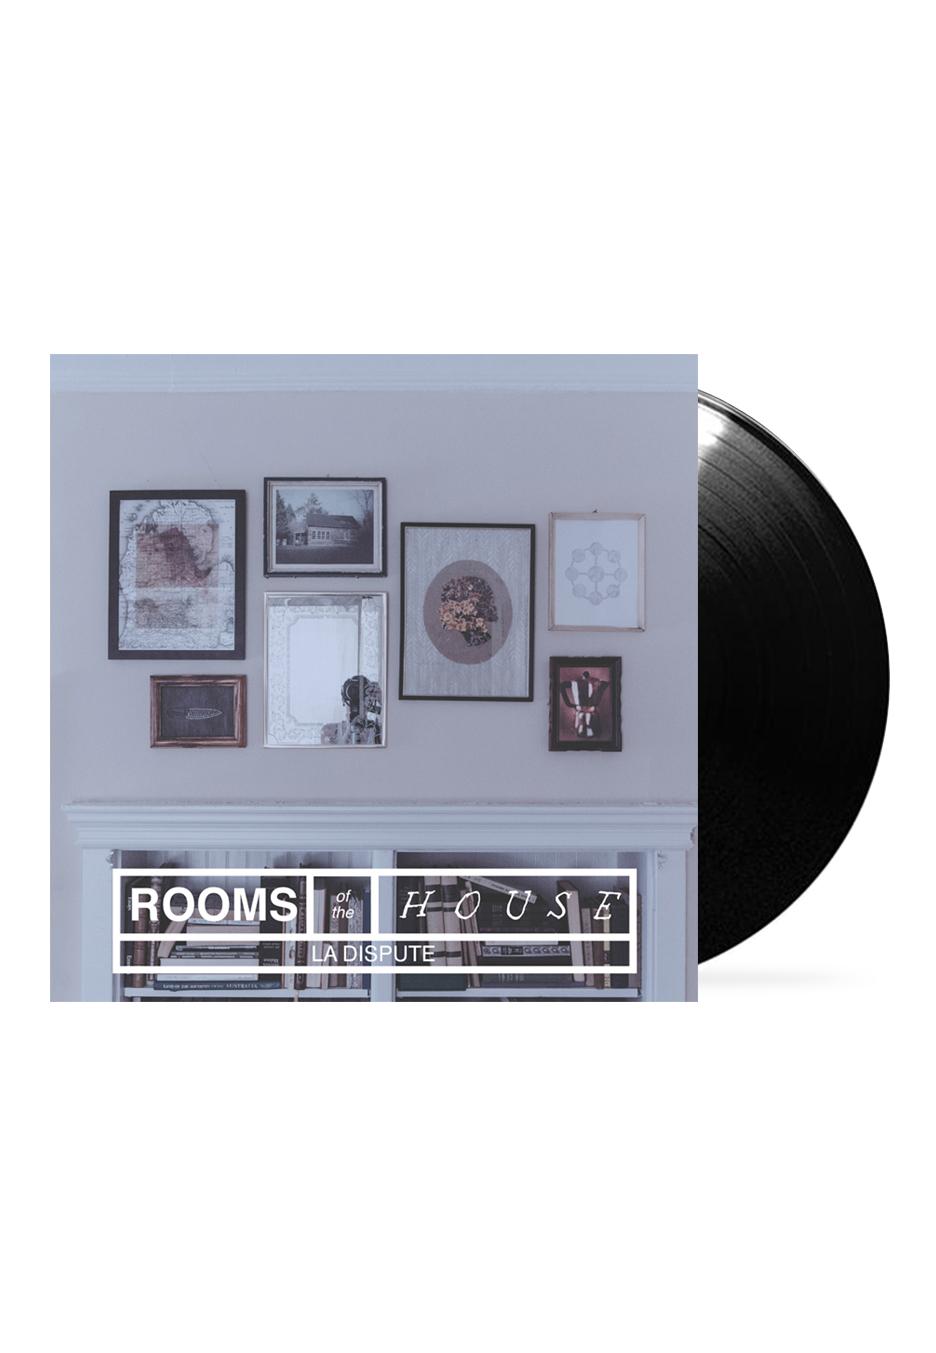 La Dispute - The Rooms Of The House - Vinyl